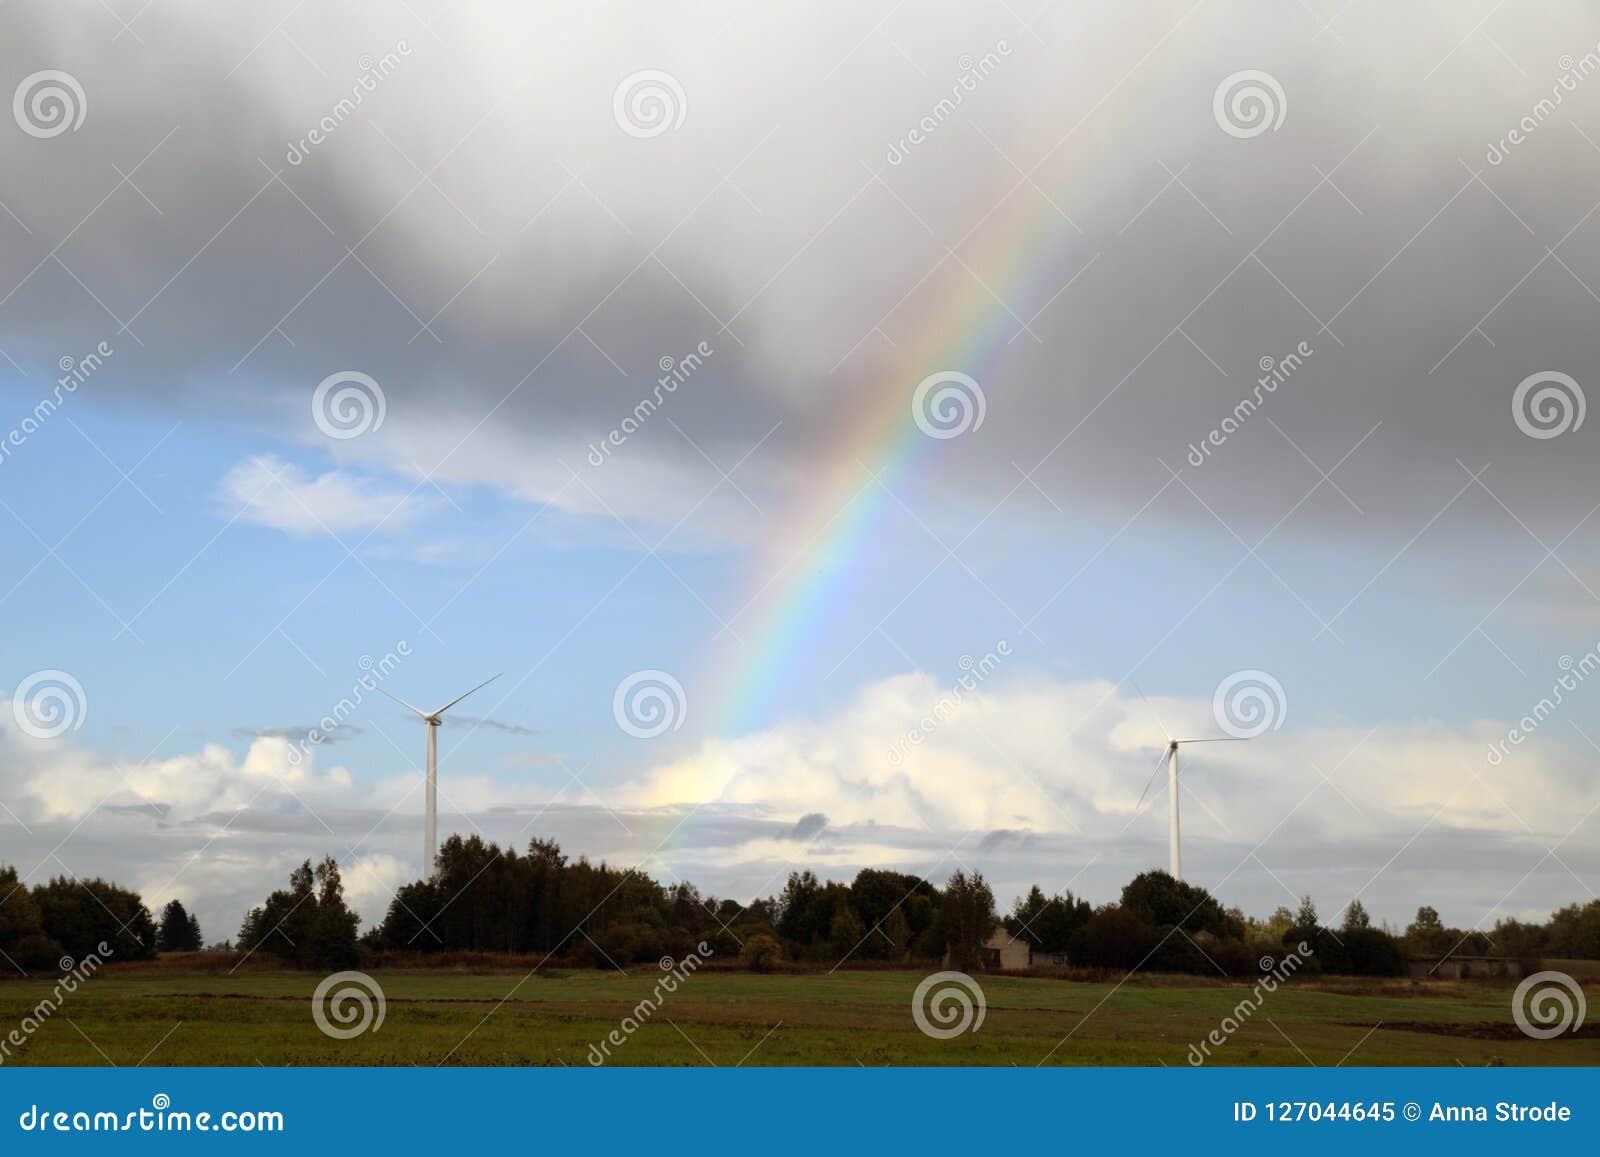 Rainbow Near The Energy Generators At Countryside  Stock